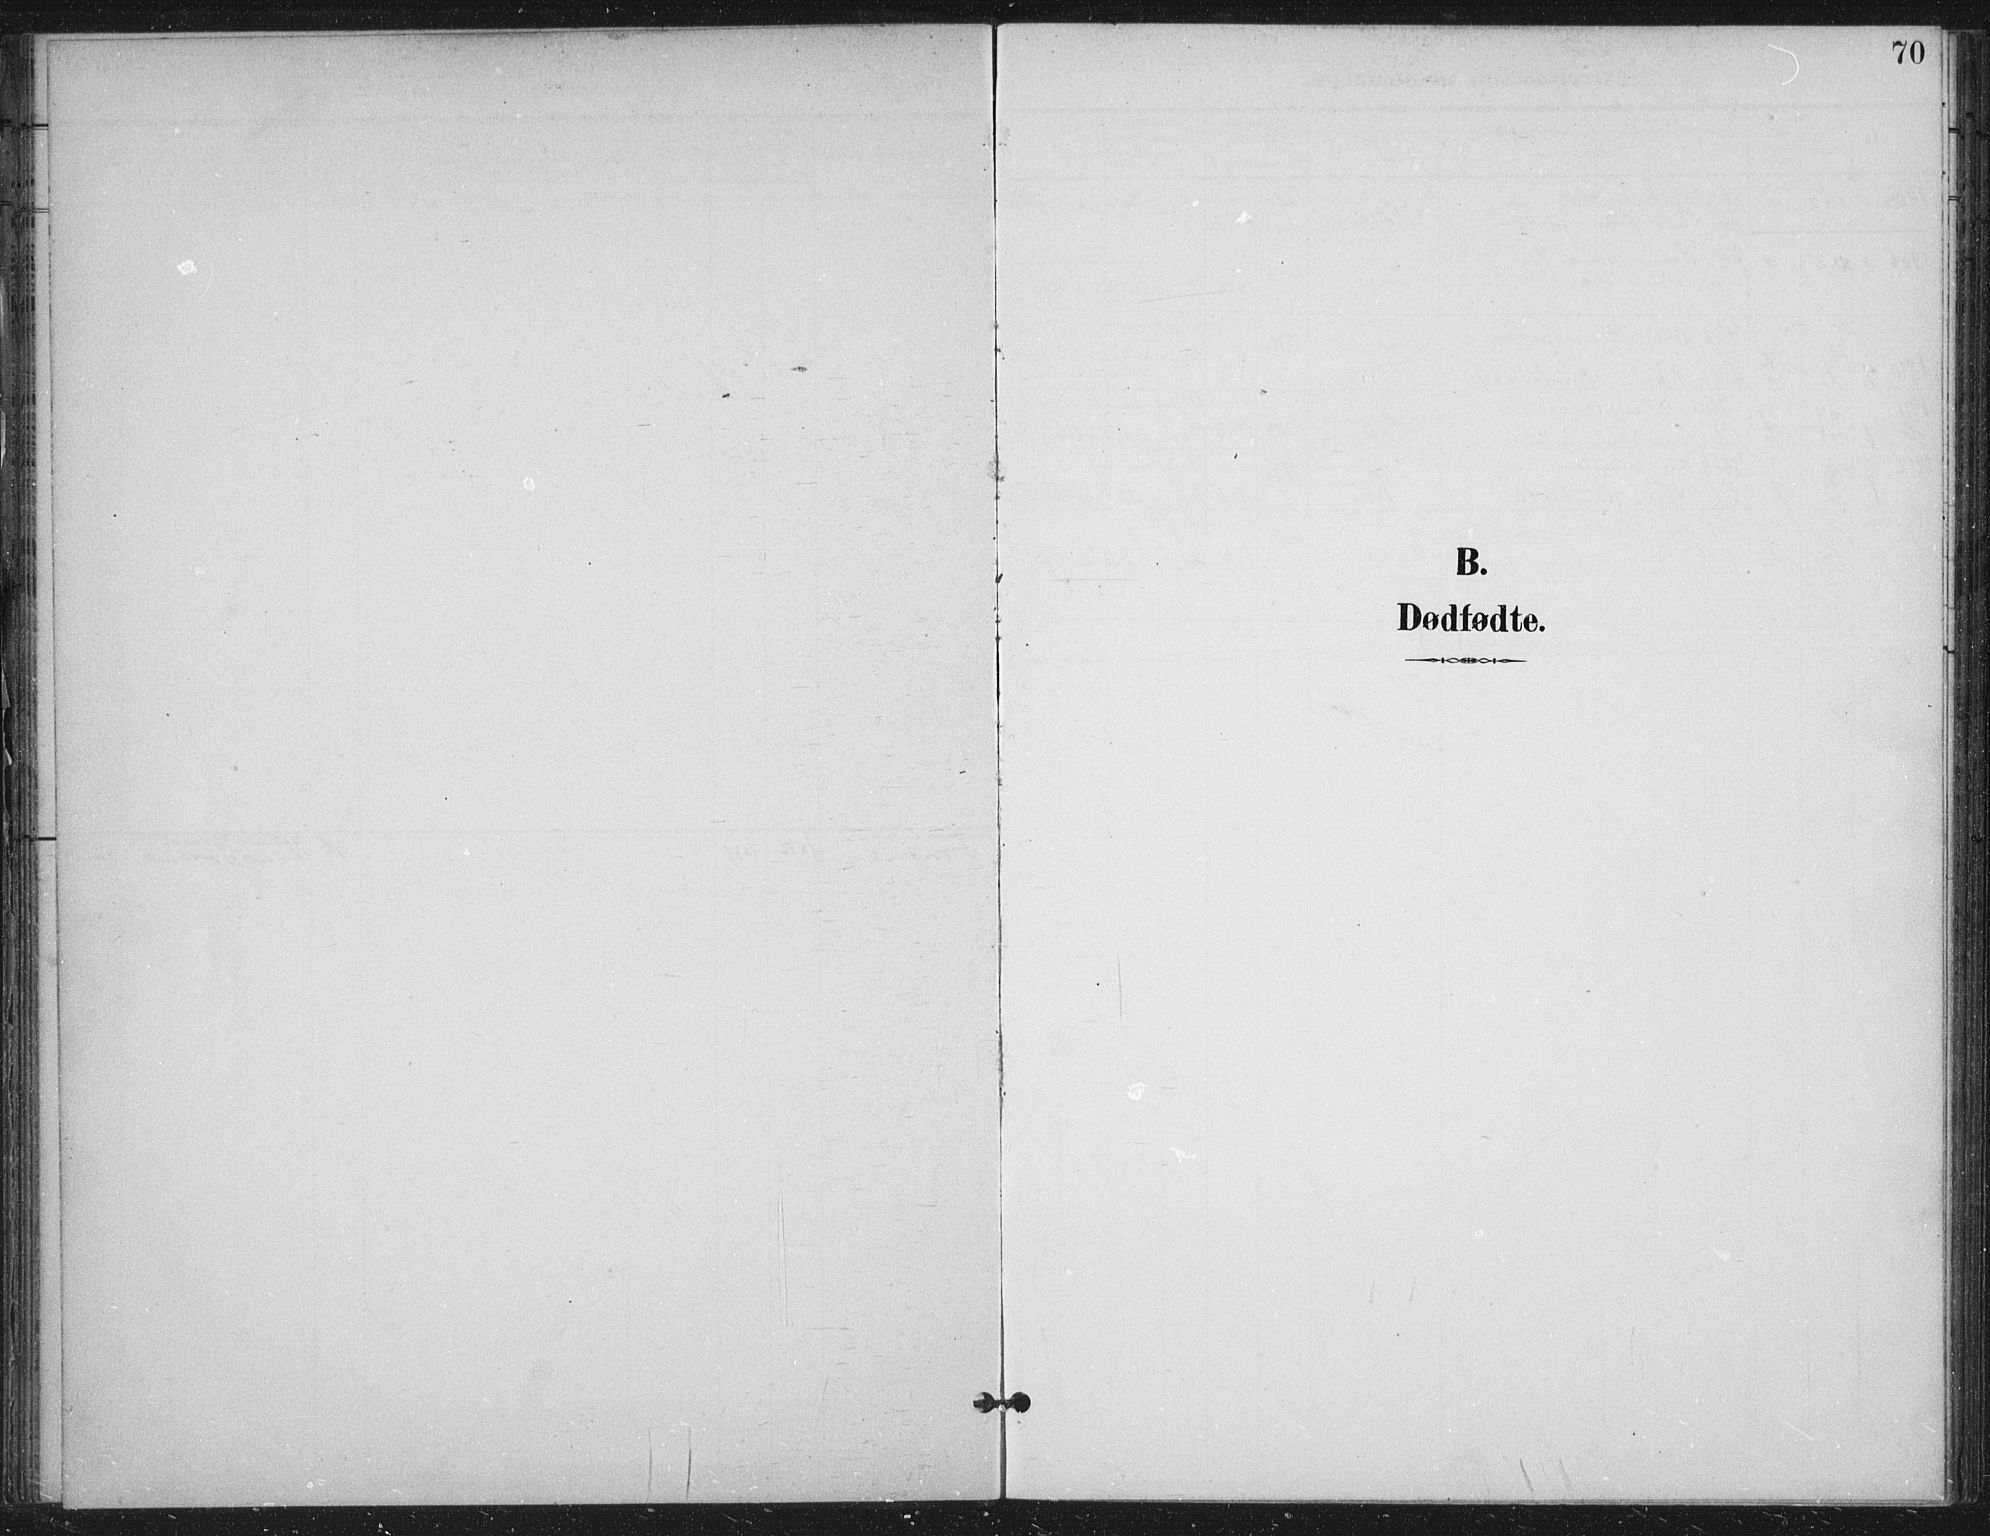 SAST, Høgsfjord sokneprestkontor, H/Ha/Haa/L0008: Ministerialbok nr. A 8, 1898-1920, s. 70